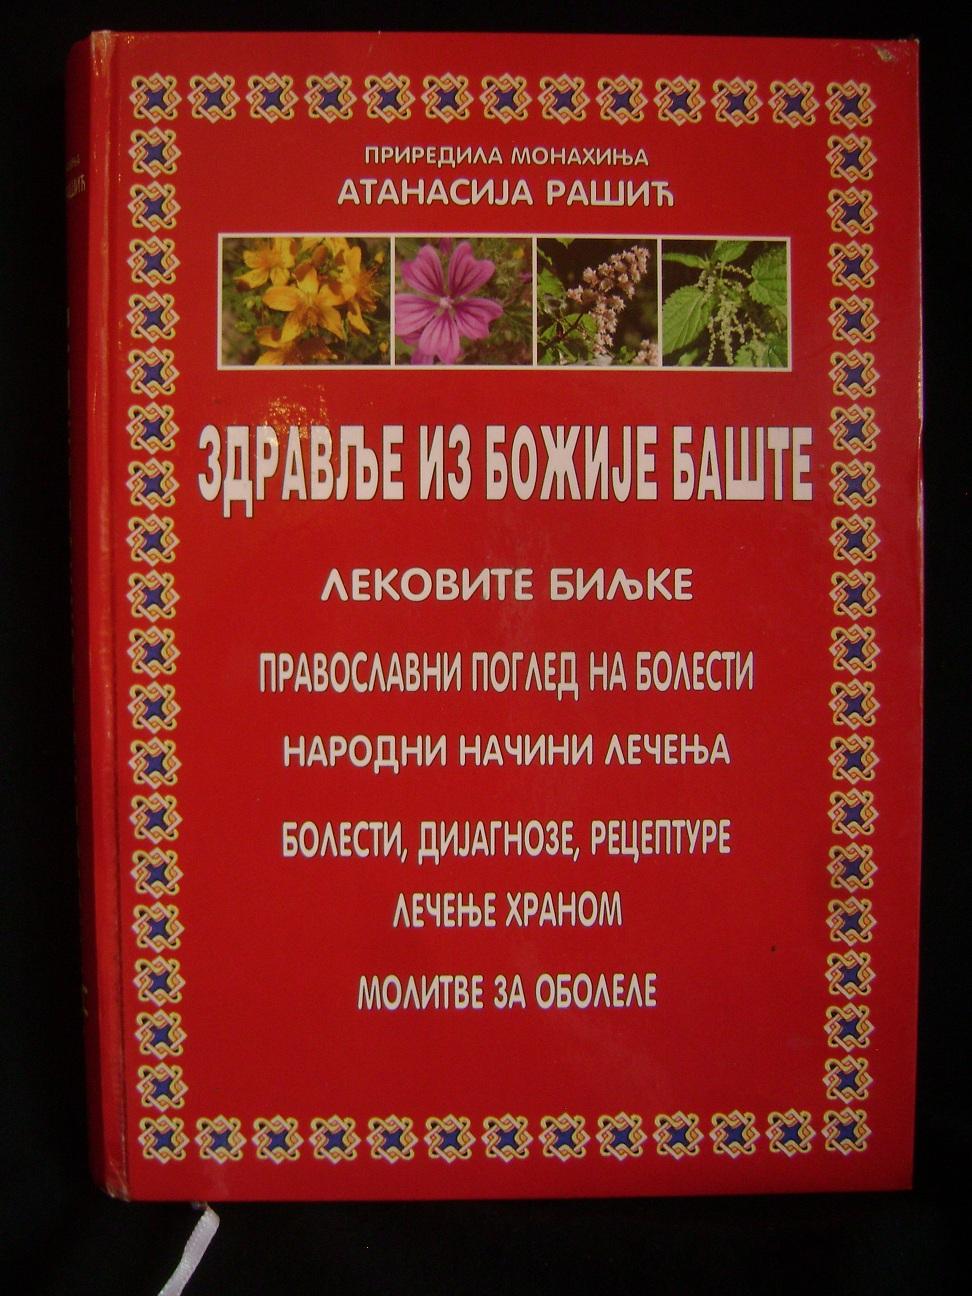 ZDRAVLJE_IZ_BOŽIJE_BAŠTE_Atanasija_Rasic_1.JPG